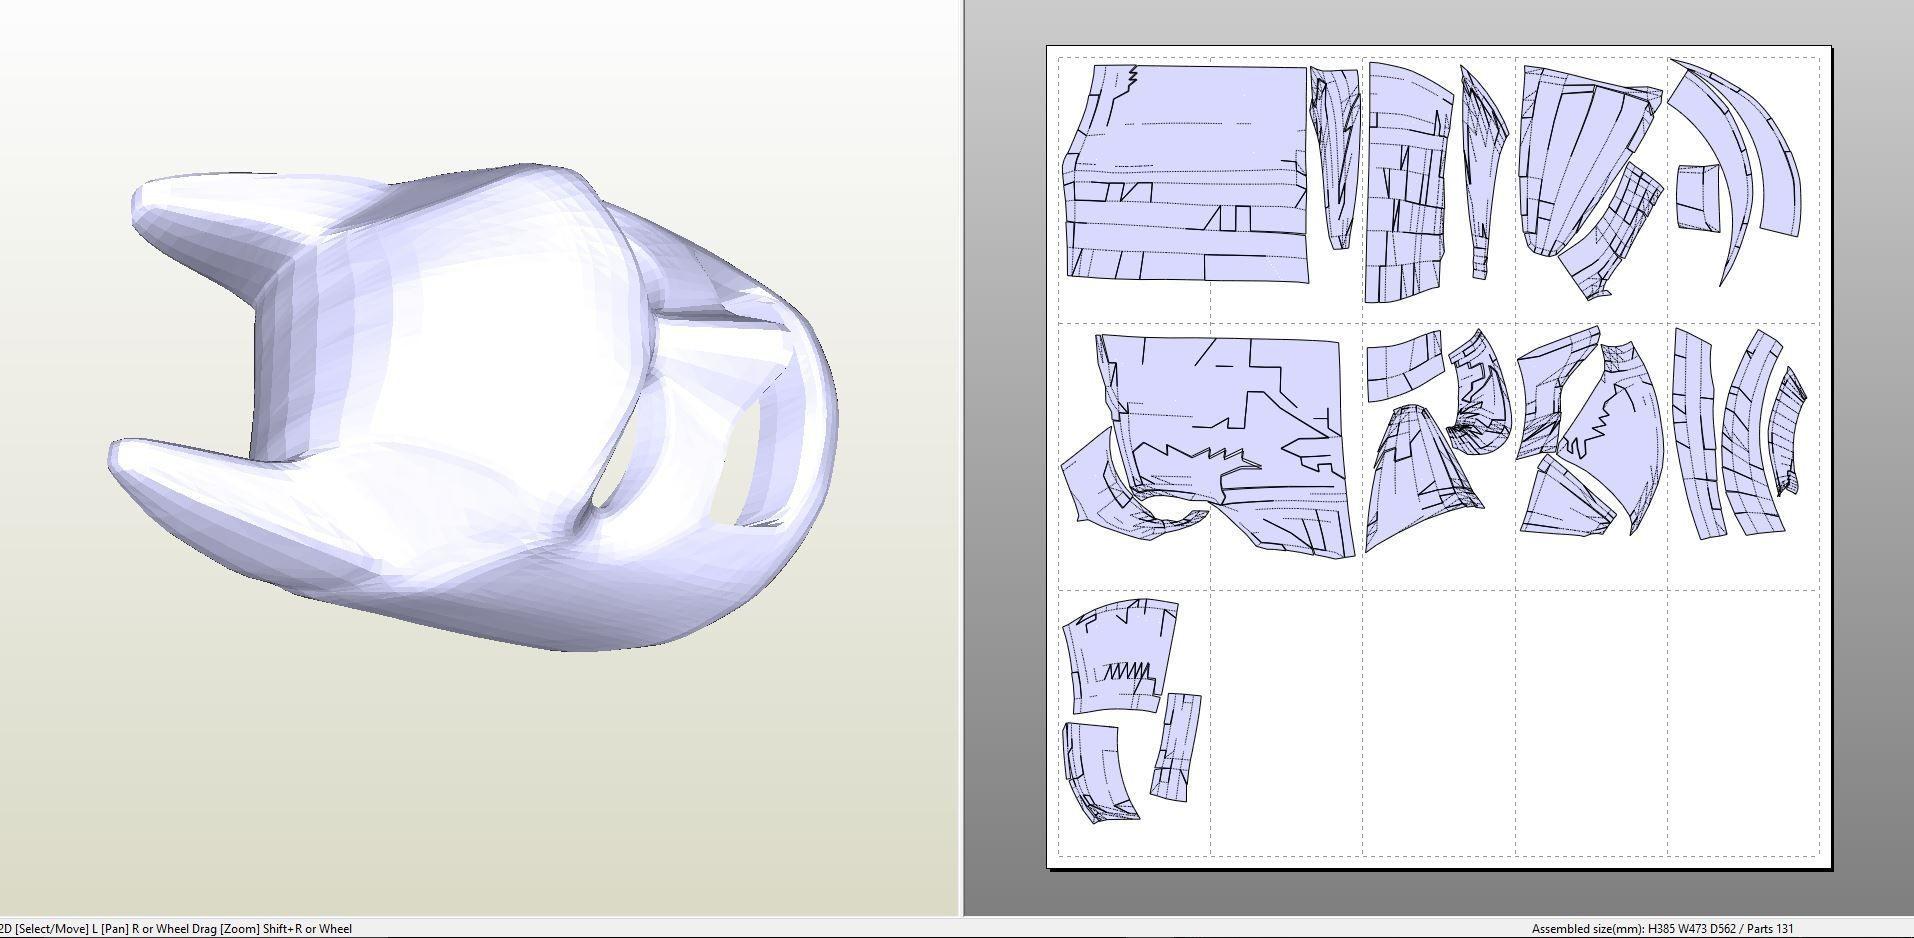 Papercraft Japan Papercraft Pdo File Template for Lego Batman Cowl Foam